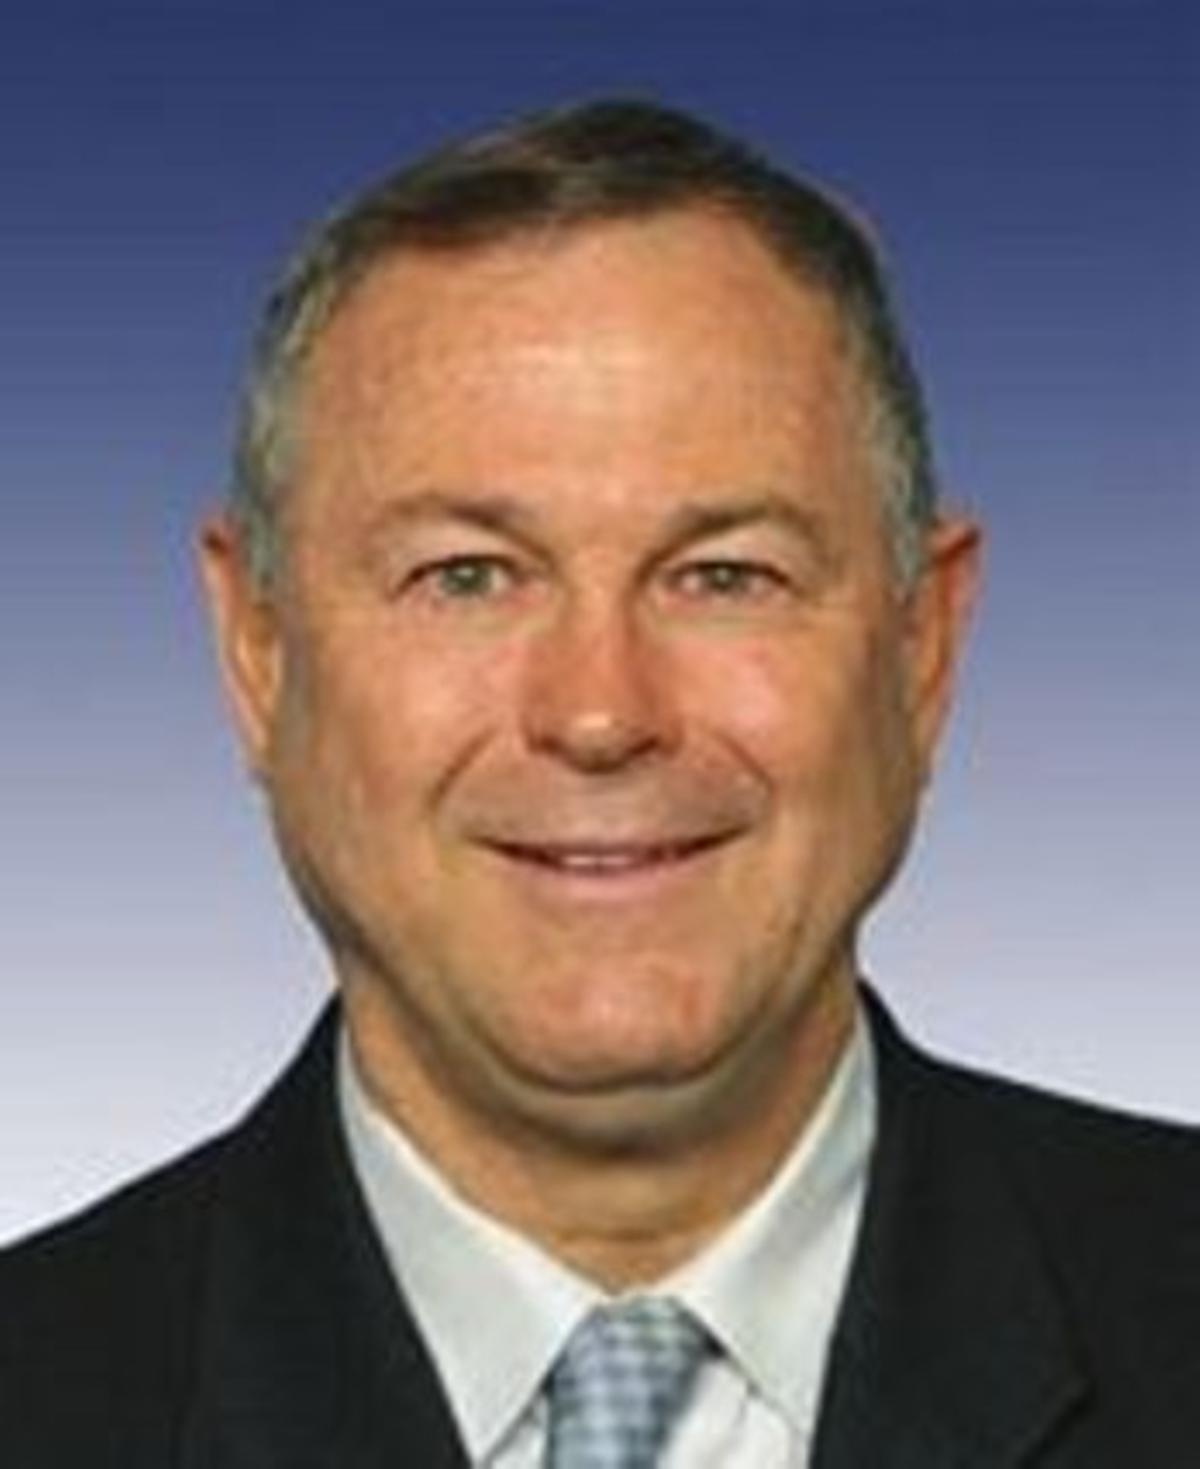 El republicano Dana Rohrabacher, presidente del subcomité de Asuntos Exteriores del Congreso para Europa y Eurasia.